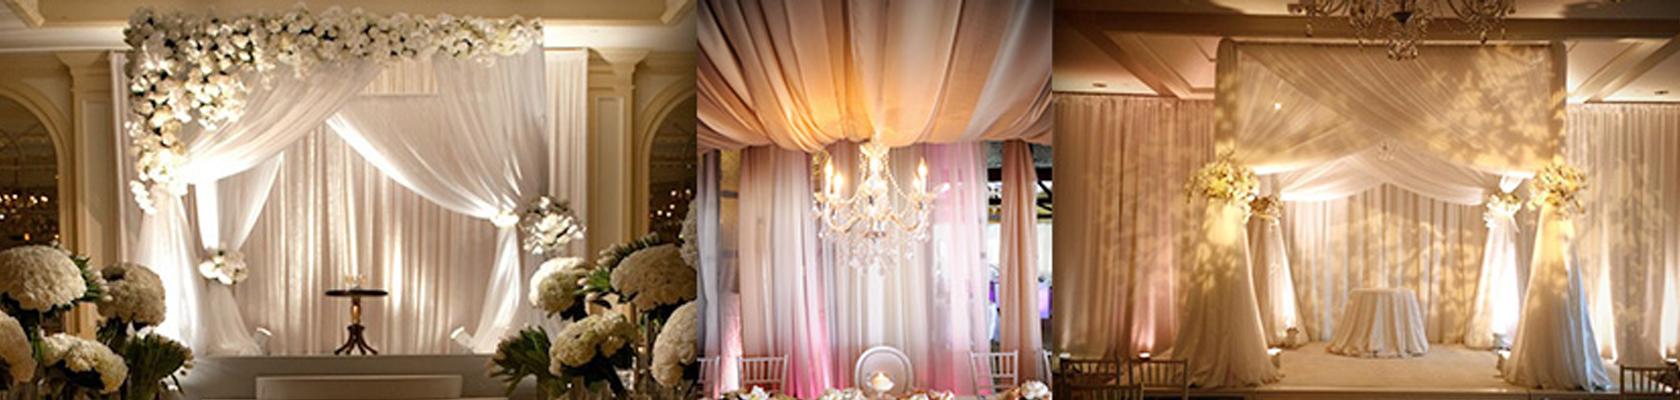 Pipe and Drape Backdrops Wedding Decor